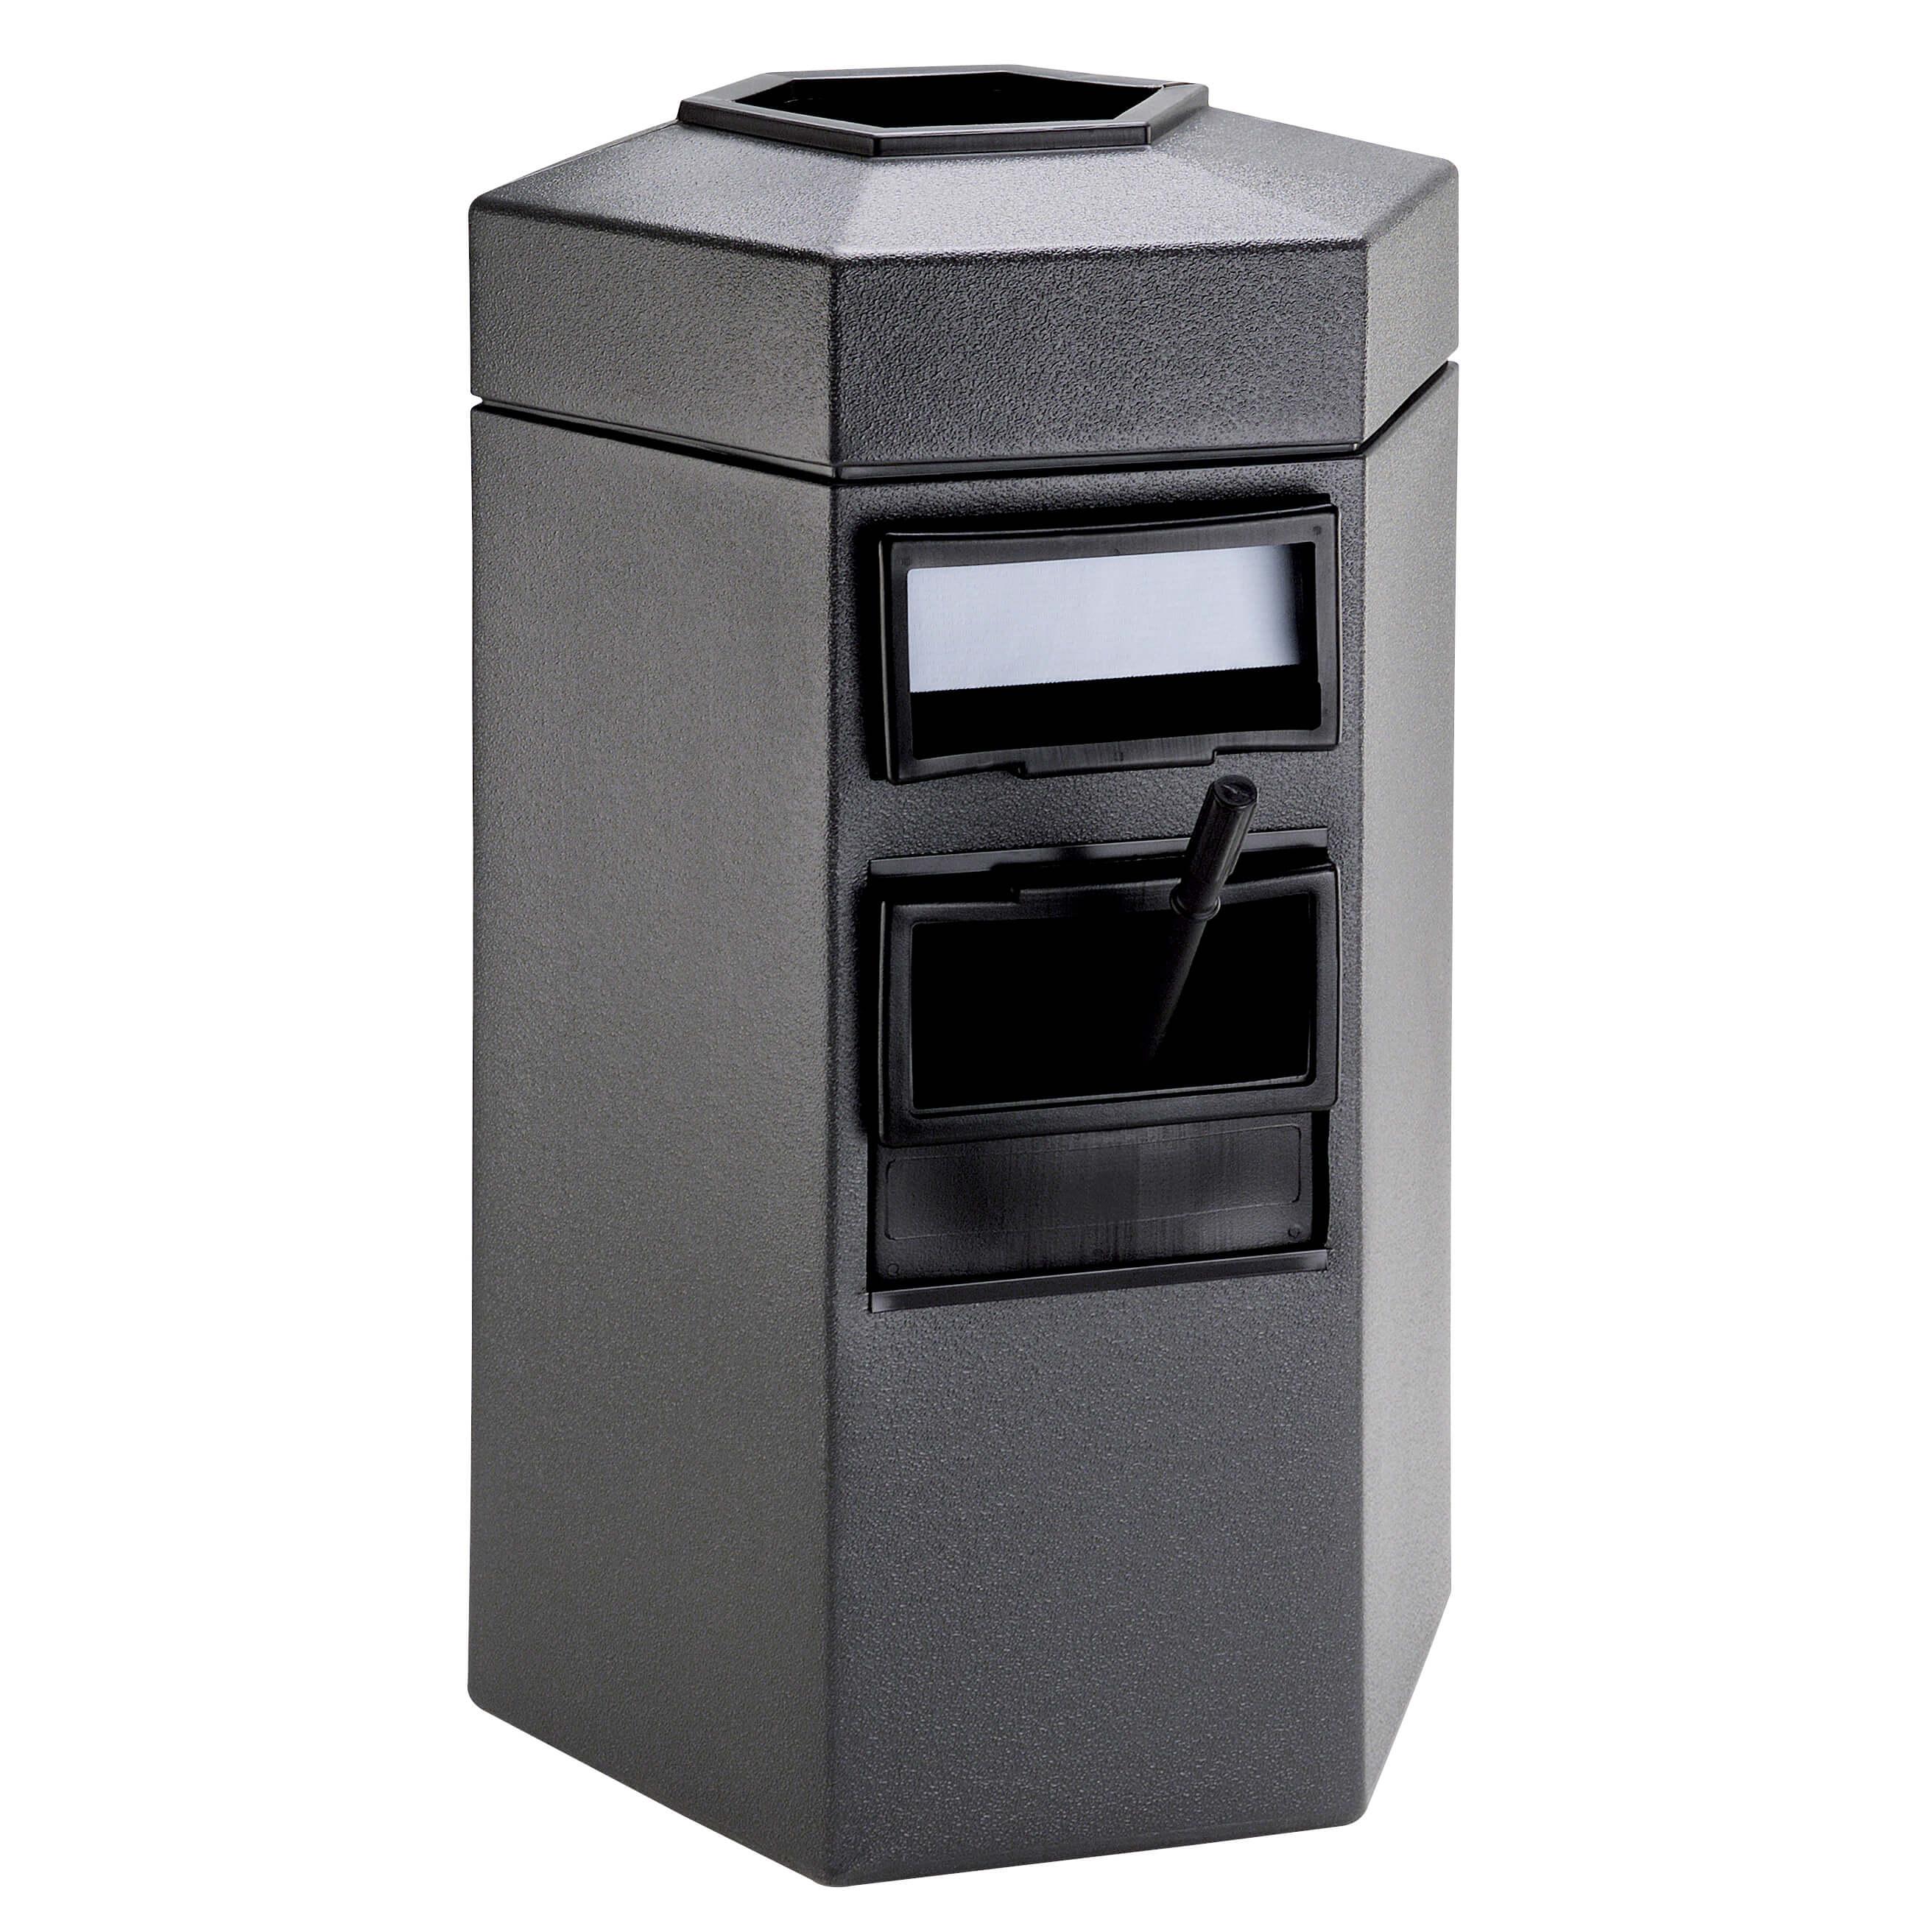 Bermuda 1 Trash Can Amp Windshield Washing Station Trash